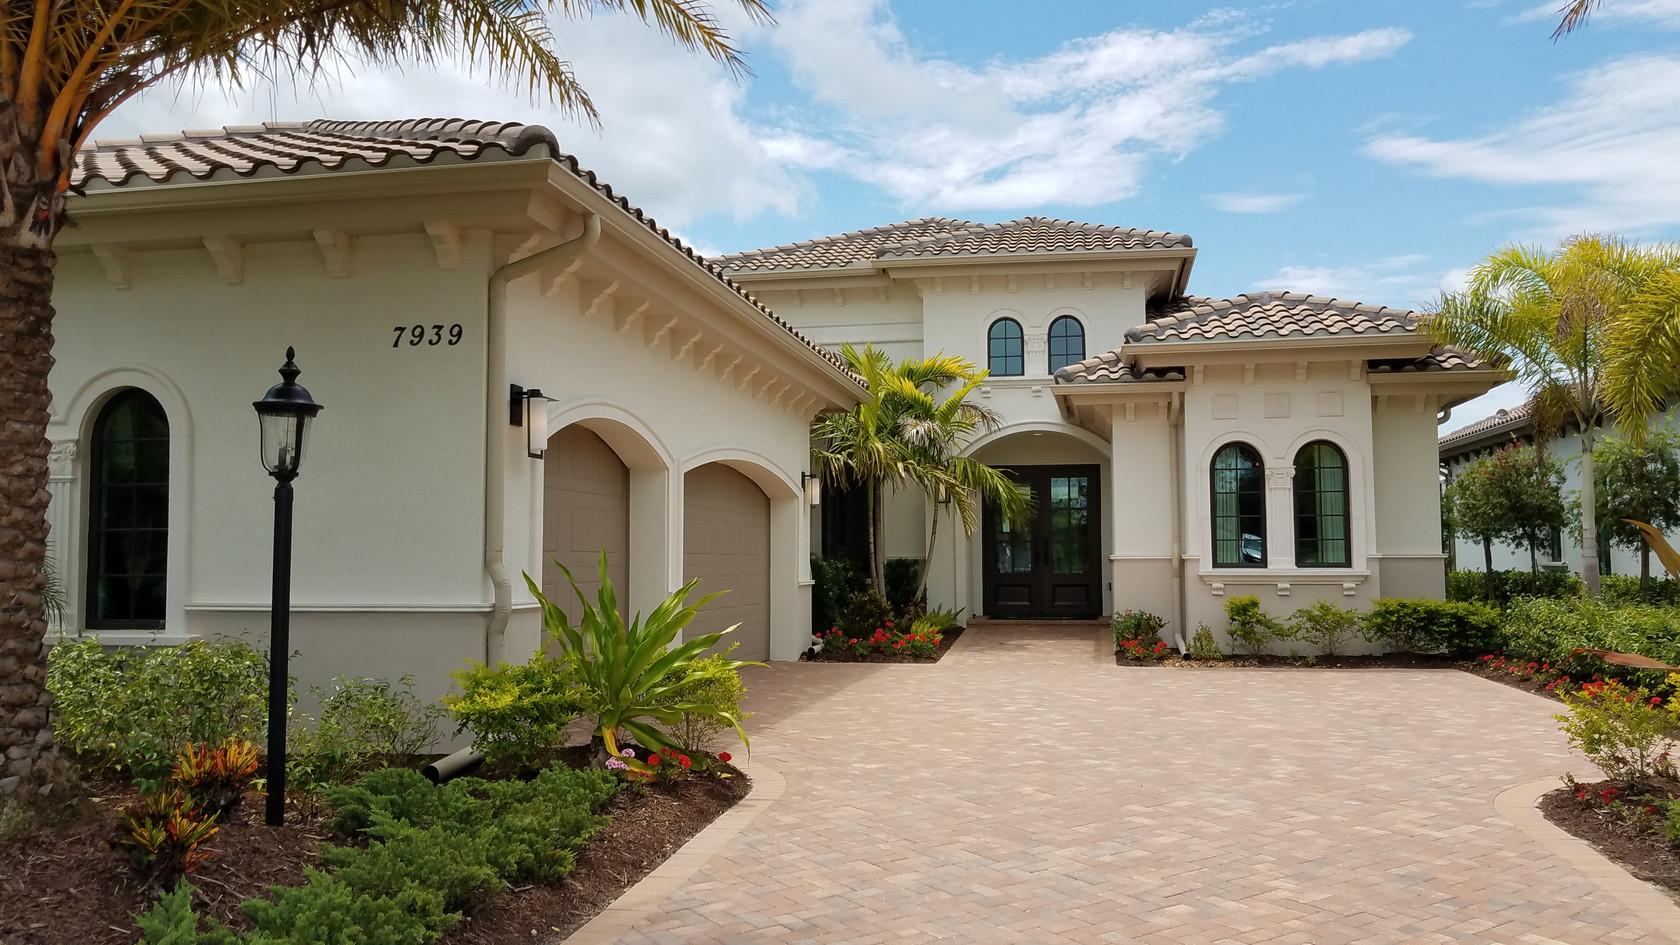 The Lake Club model home exterior